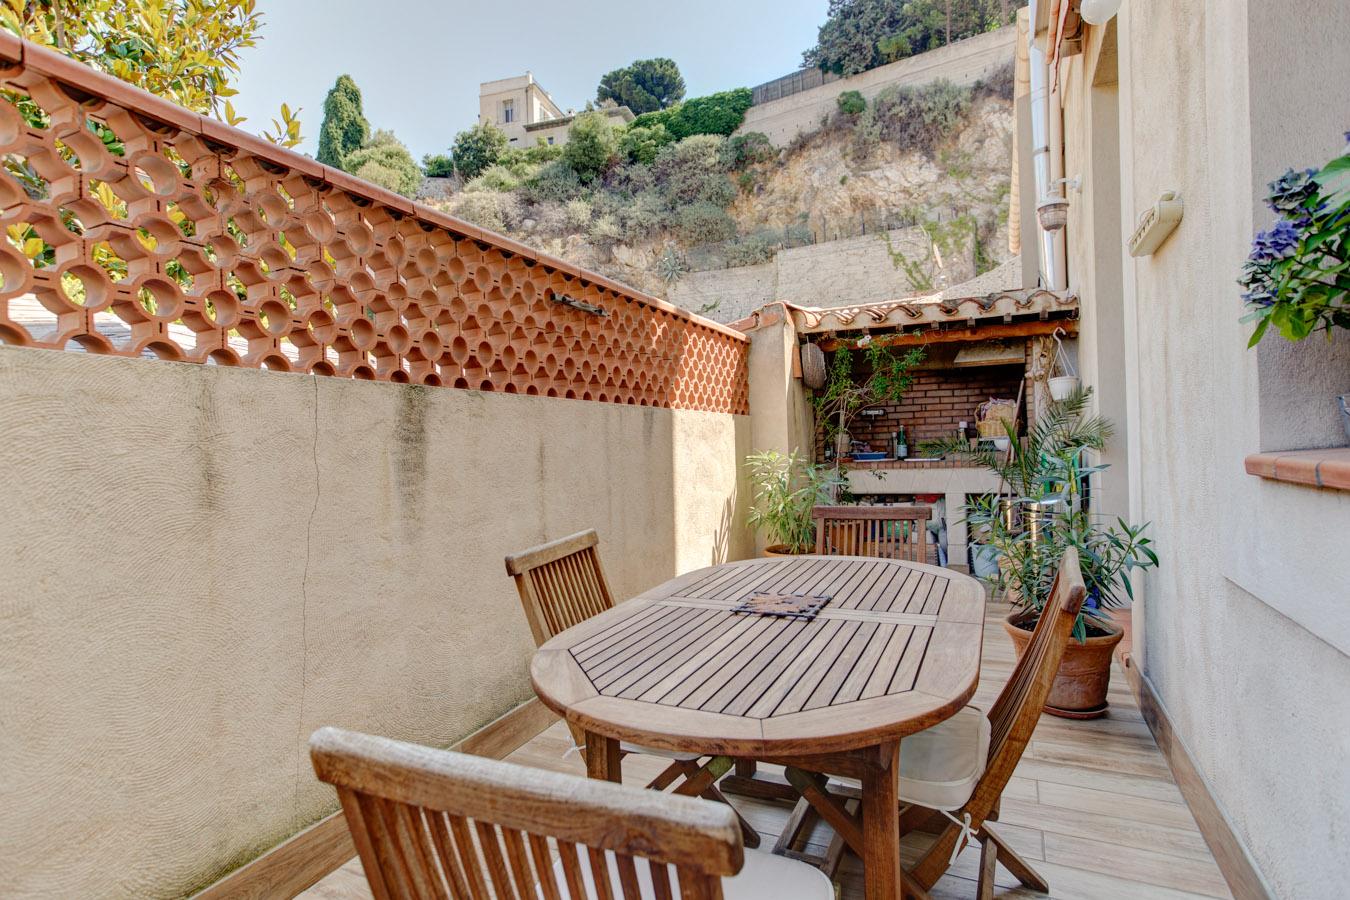 terrasse-8-3.jpg